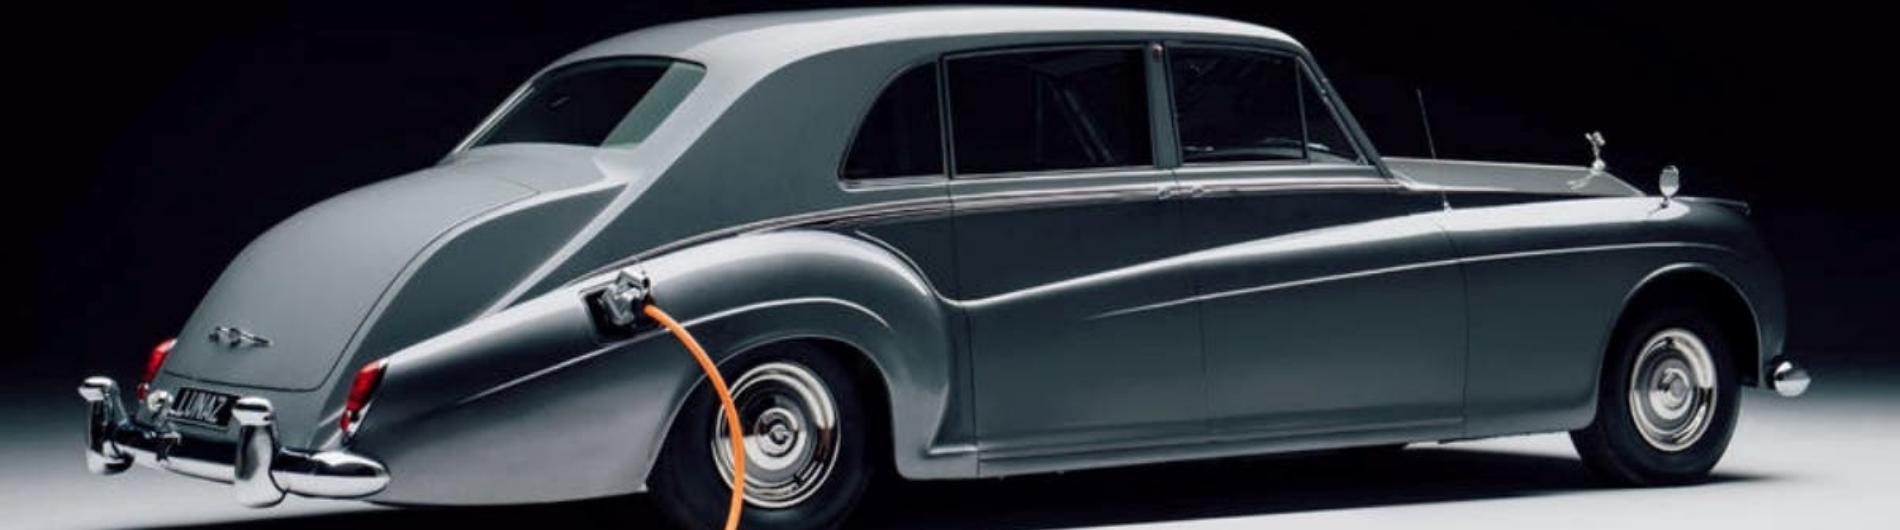 Rolls Royce Electrico